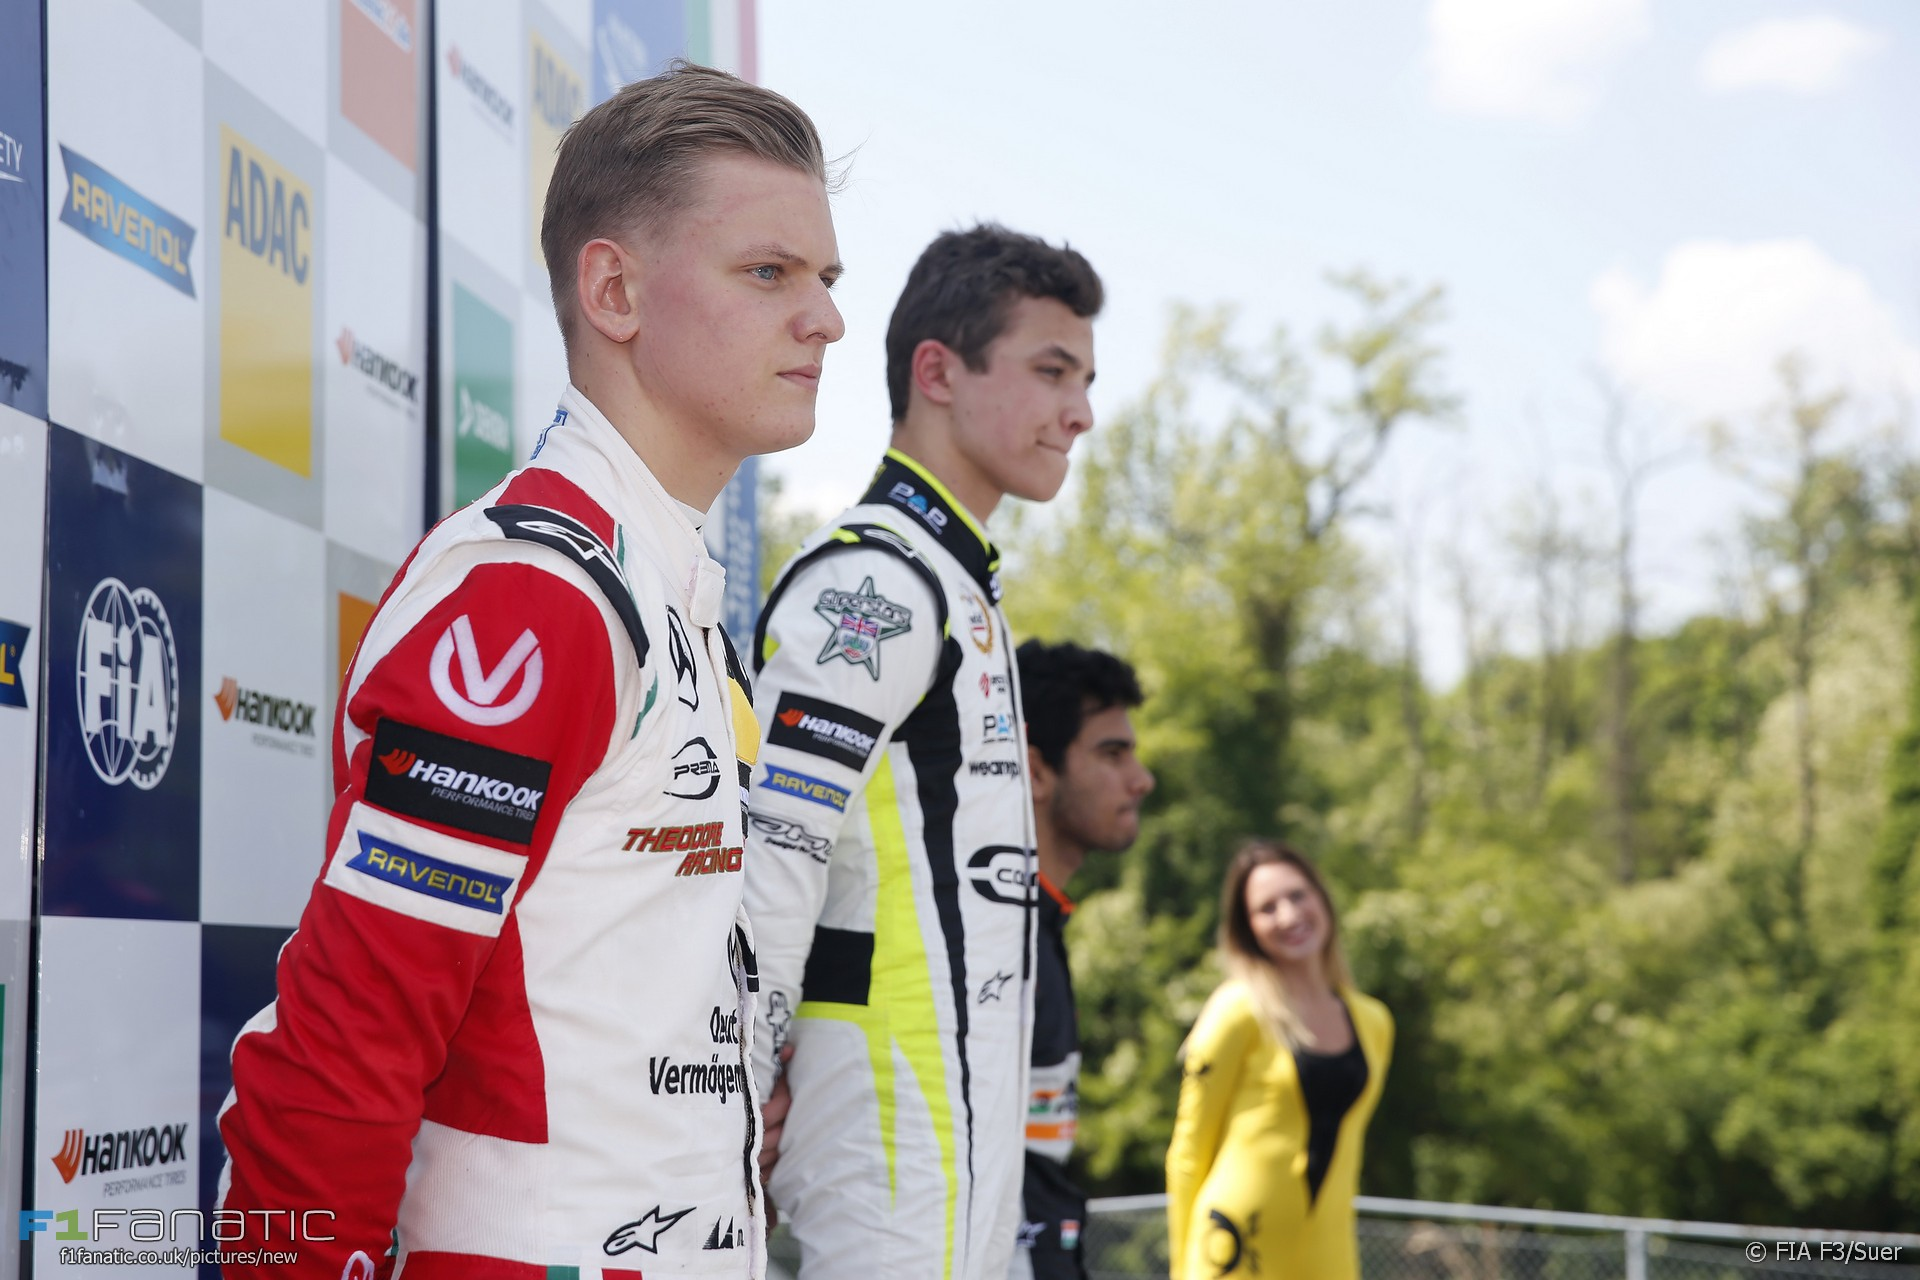 Mick Schumacher, Lando Norris, Jehan Daruvala, Monza, F3, 2017